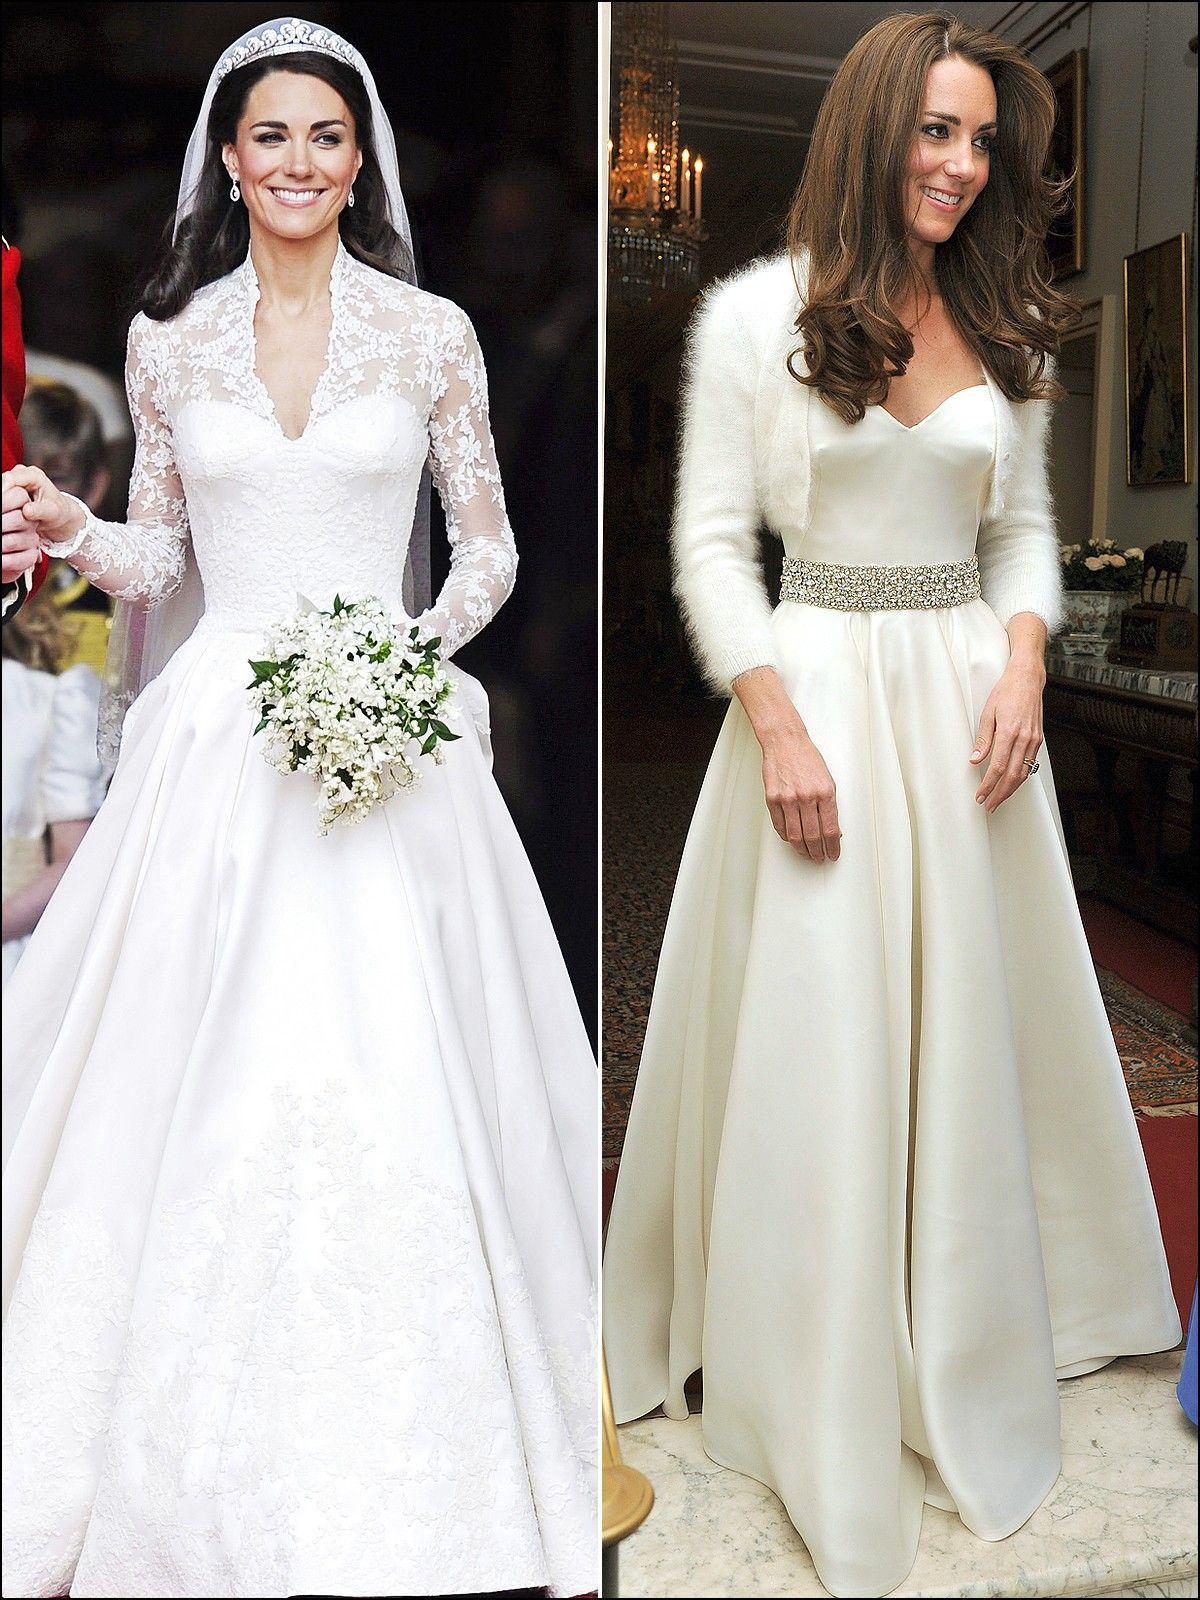 Kate Middleton Reception Wedding Dress Wedding Dreams Pinterest